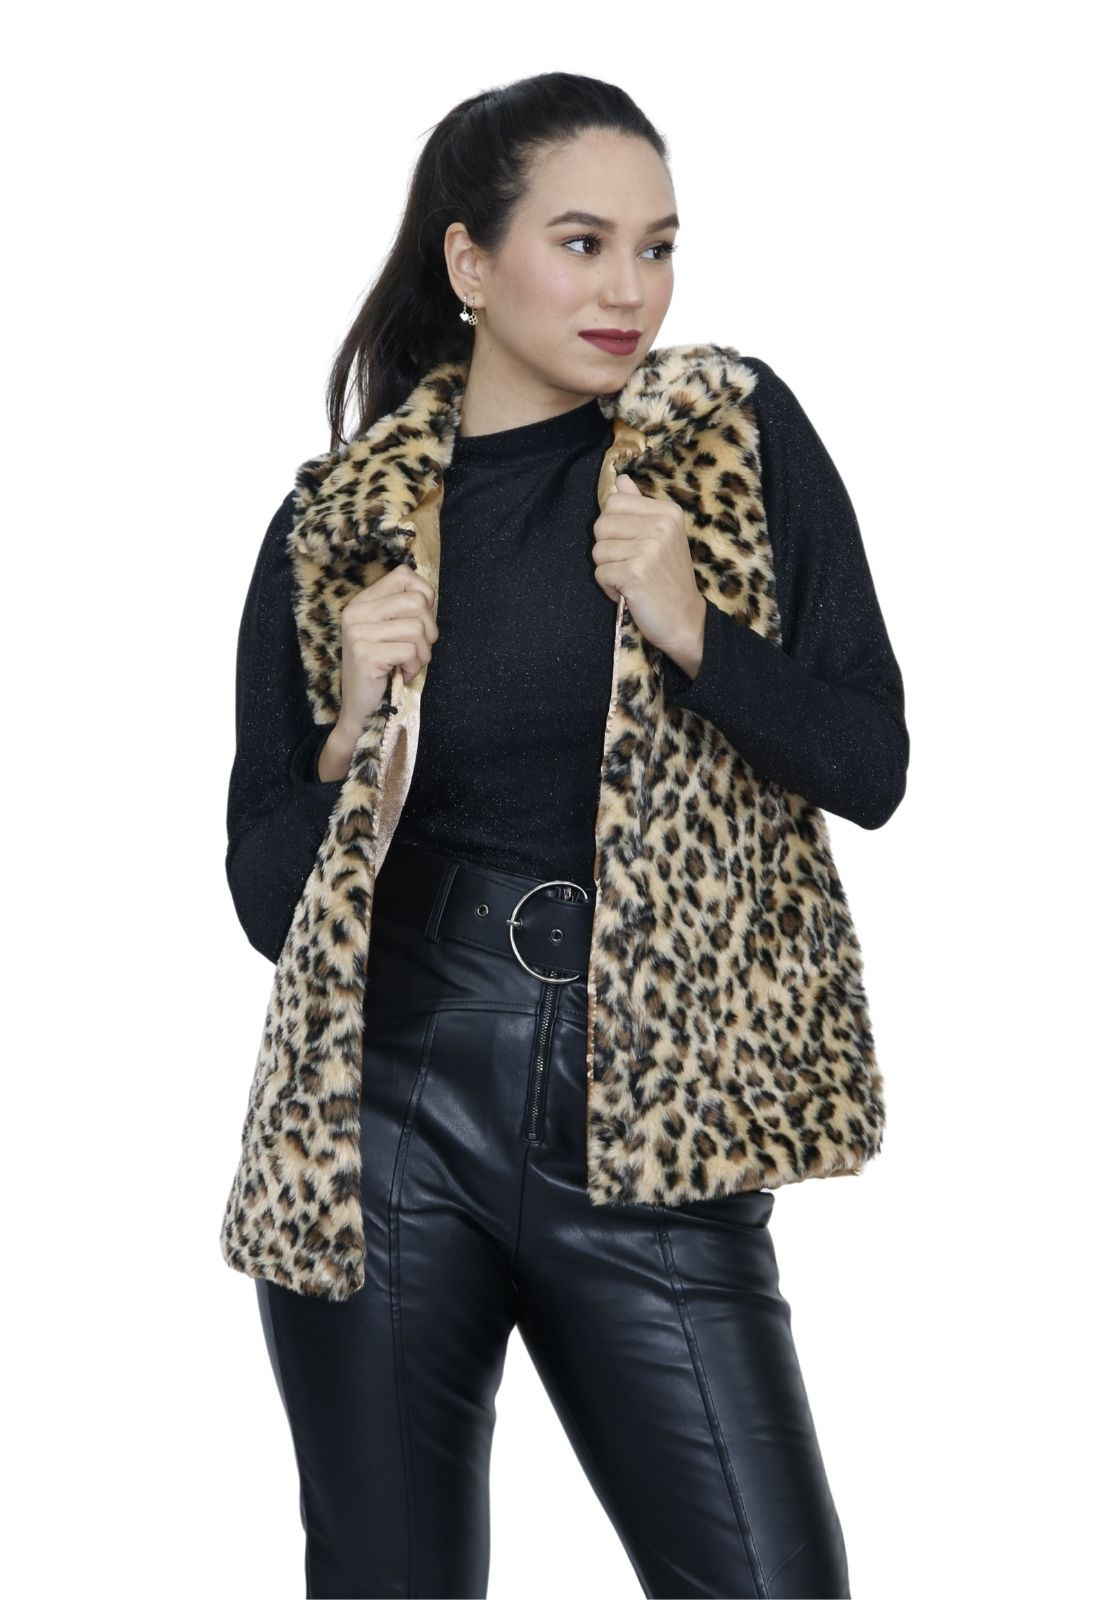 Colete Feminino de Pêlos Estampa Leopardo